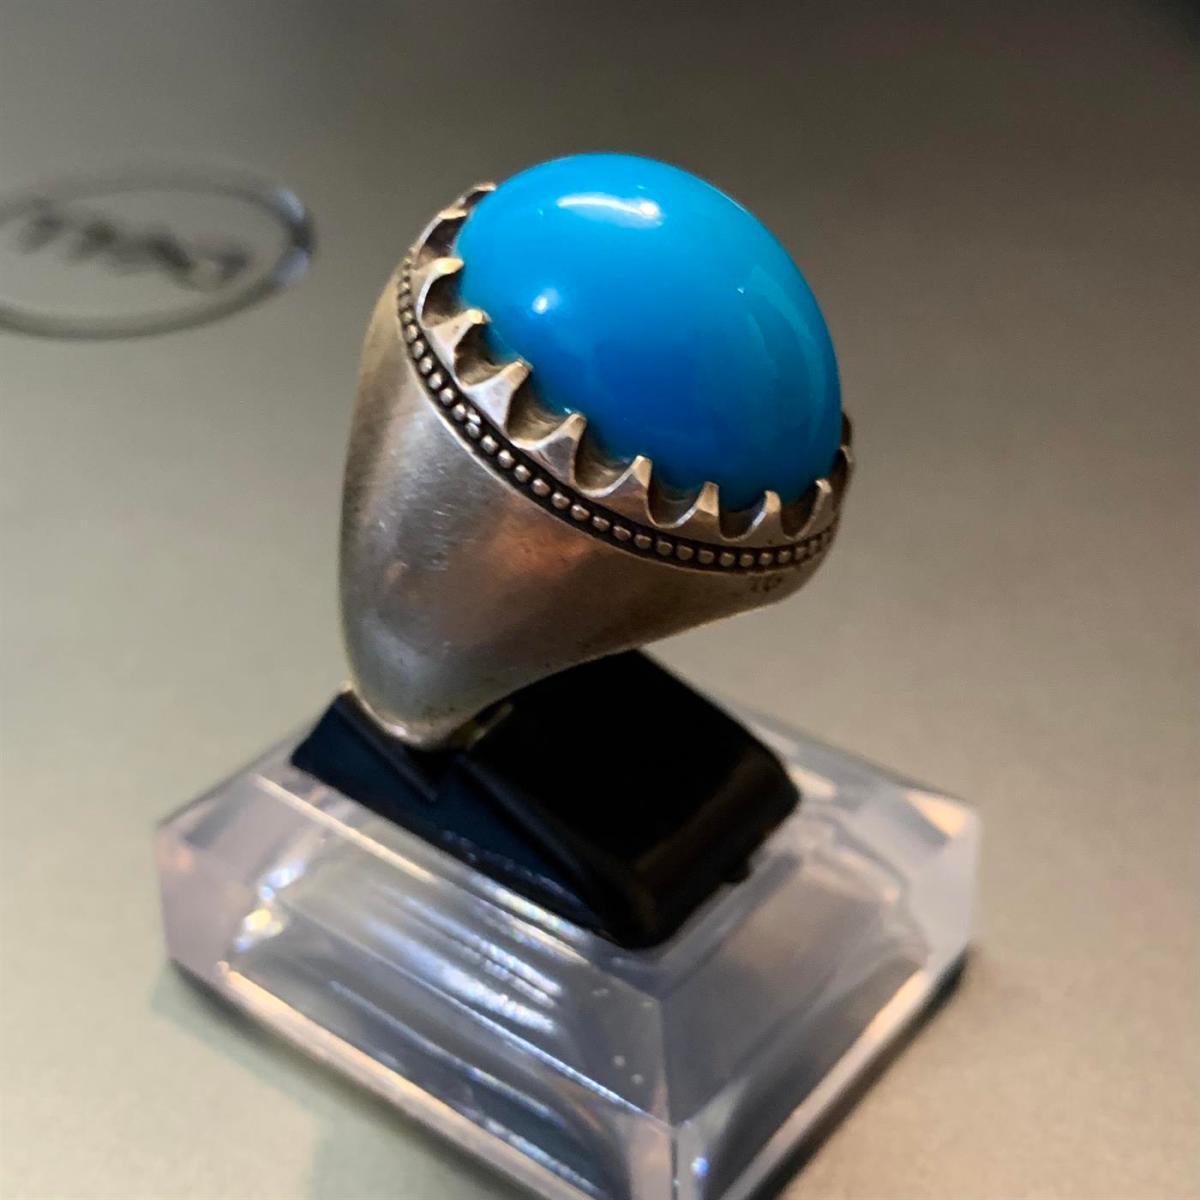 Dark Rare Color Clean Blue Feroza Nishapur Feroza Turquoise 2 natural gemstones pakistan + 925 silver jewelry online